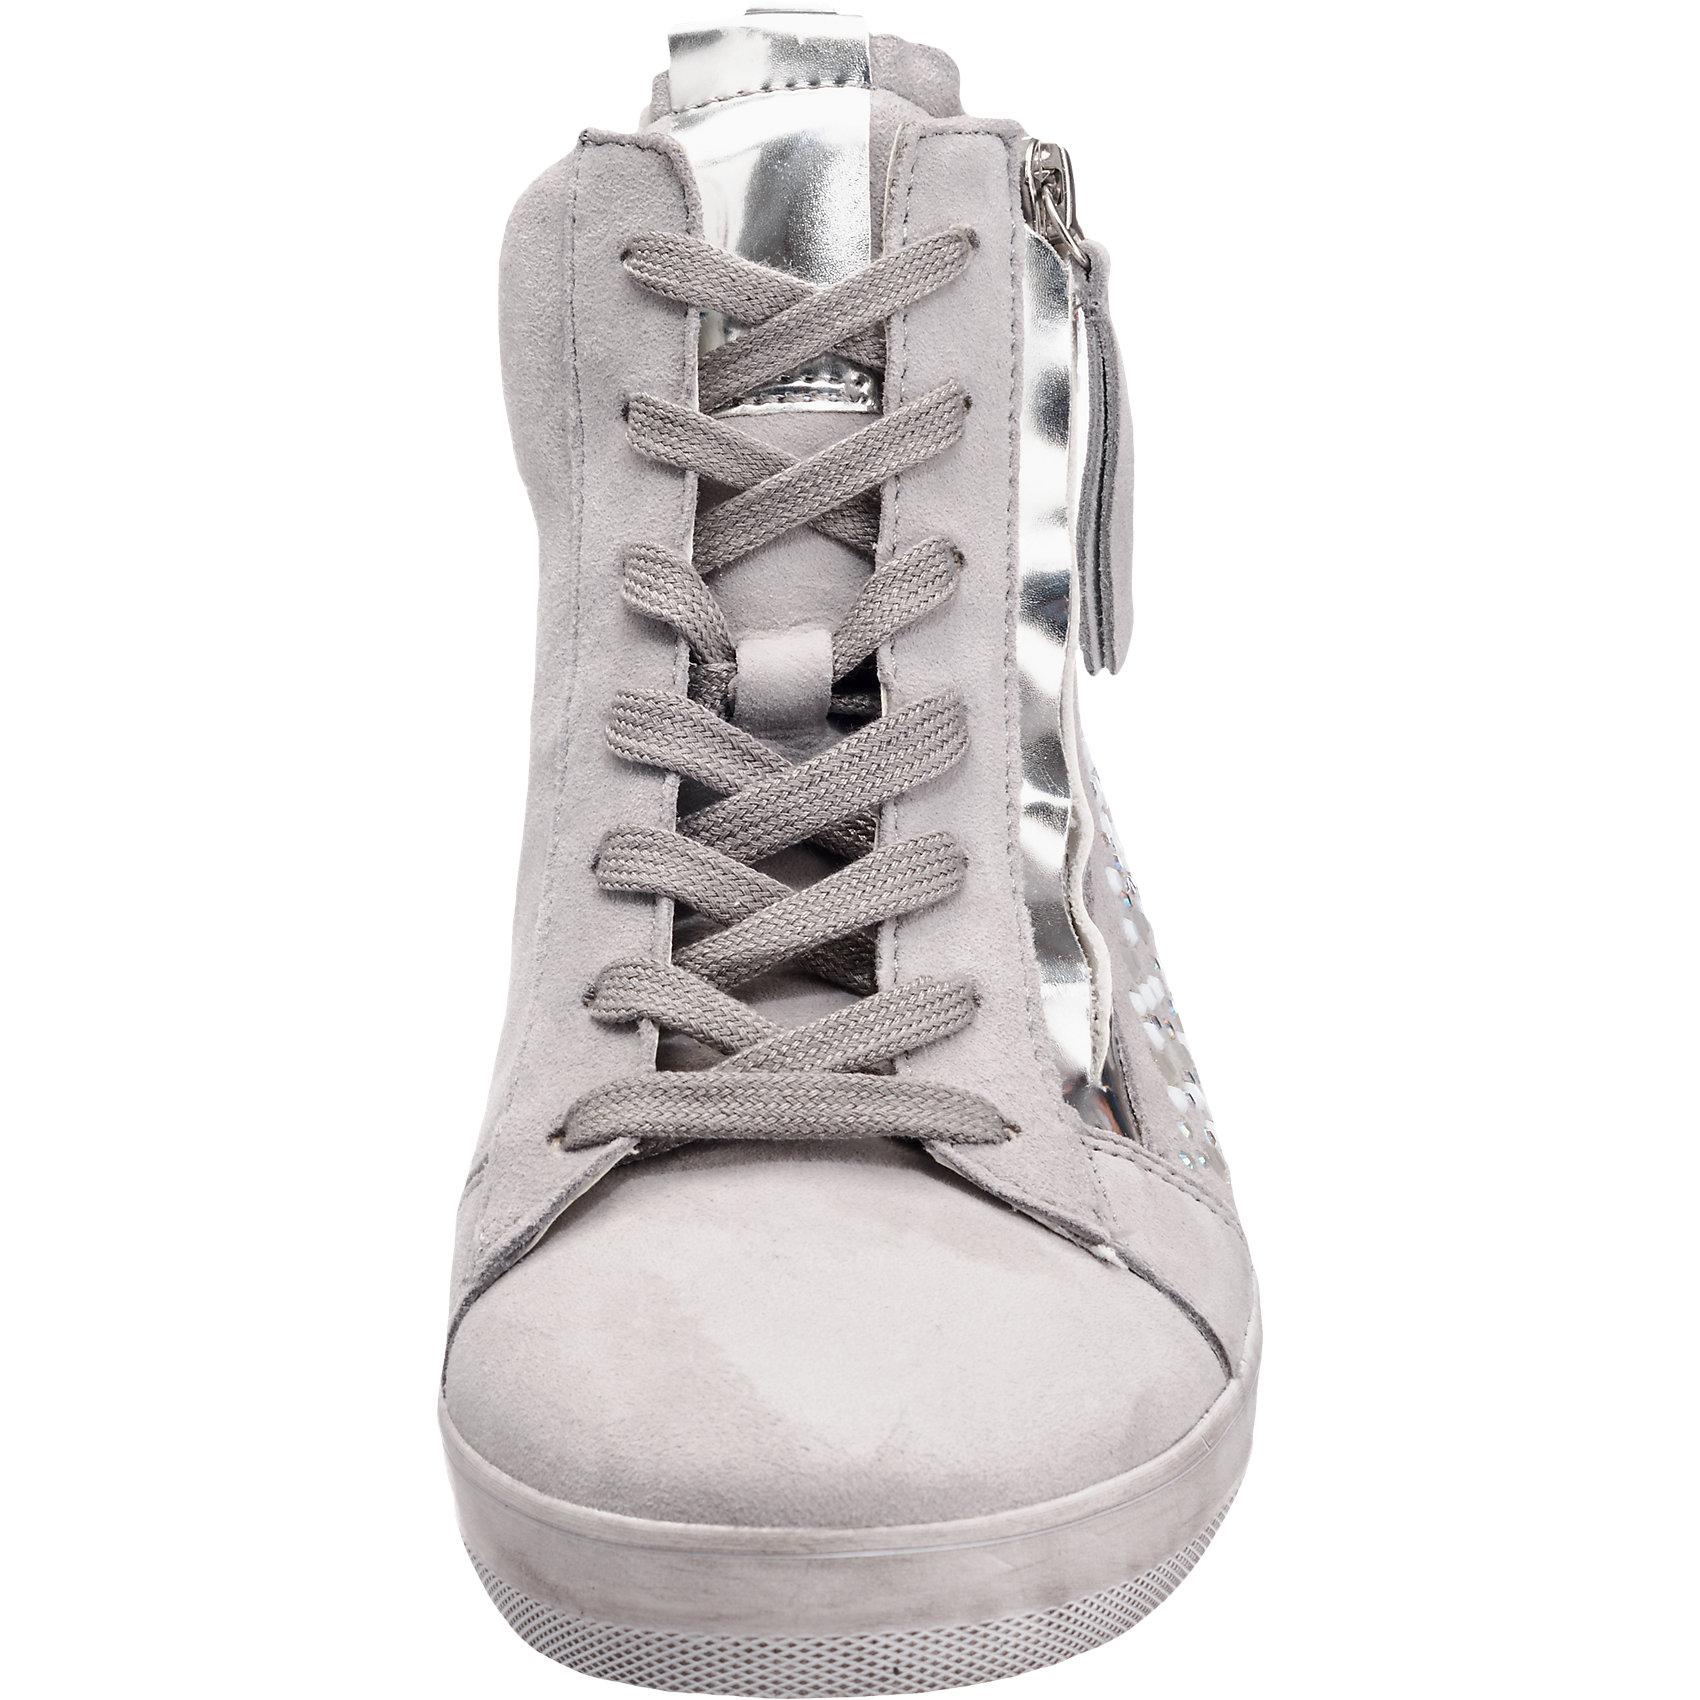 timeless design 294ca f9cfe ... Nike SB Dunk De La Soul Low Men s Size Size Size 9 2015 789841 322  Skateboarding ...